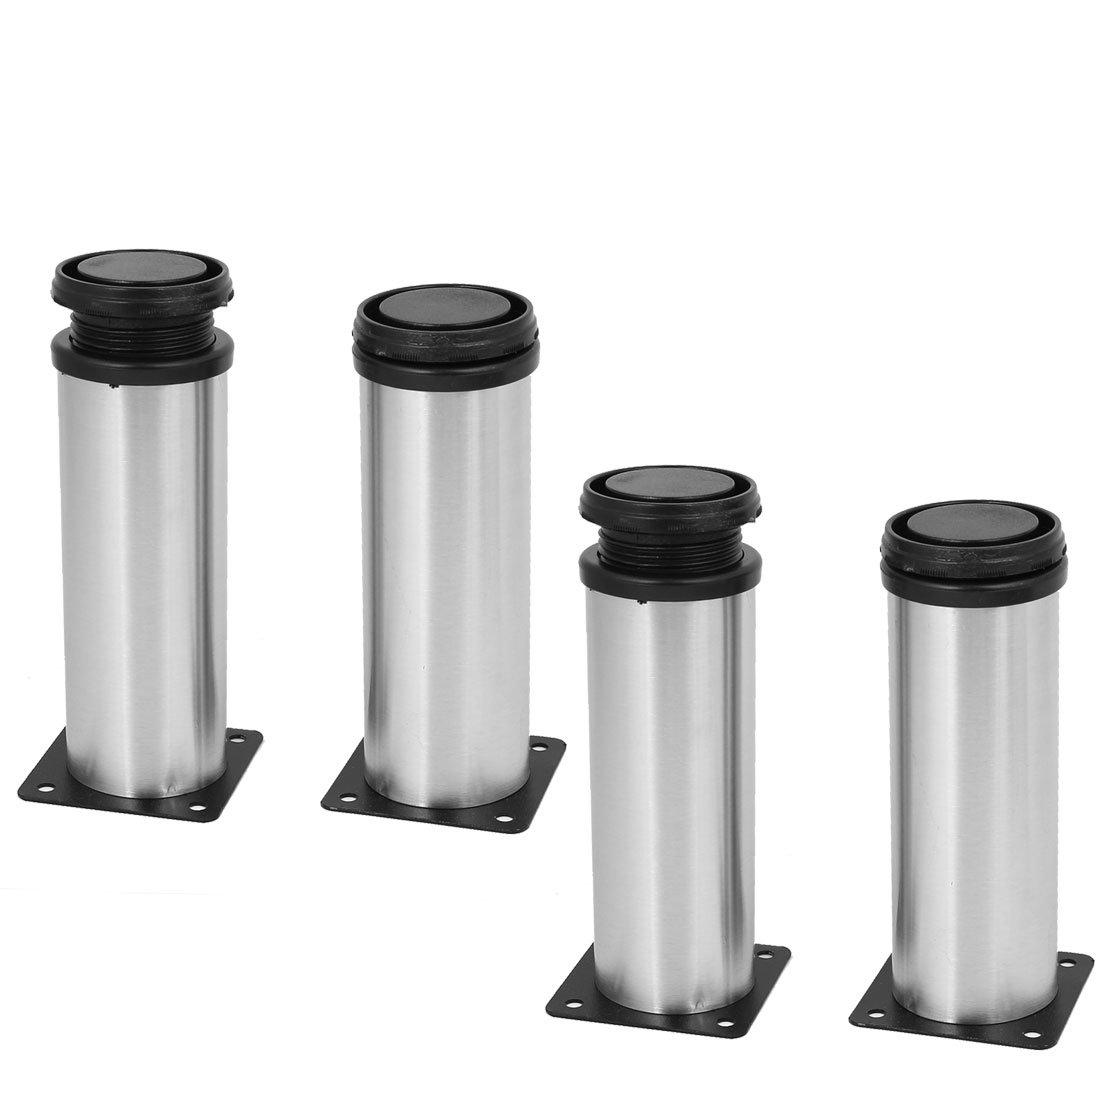 uxcell Kitchen Furniture Cabinet 50mm x 150mm Adjustable Feet Leg Round Stand 4PCS